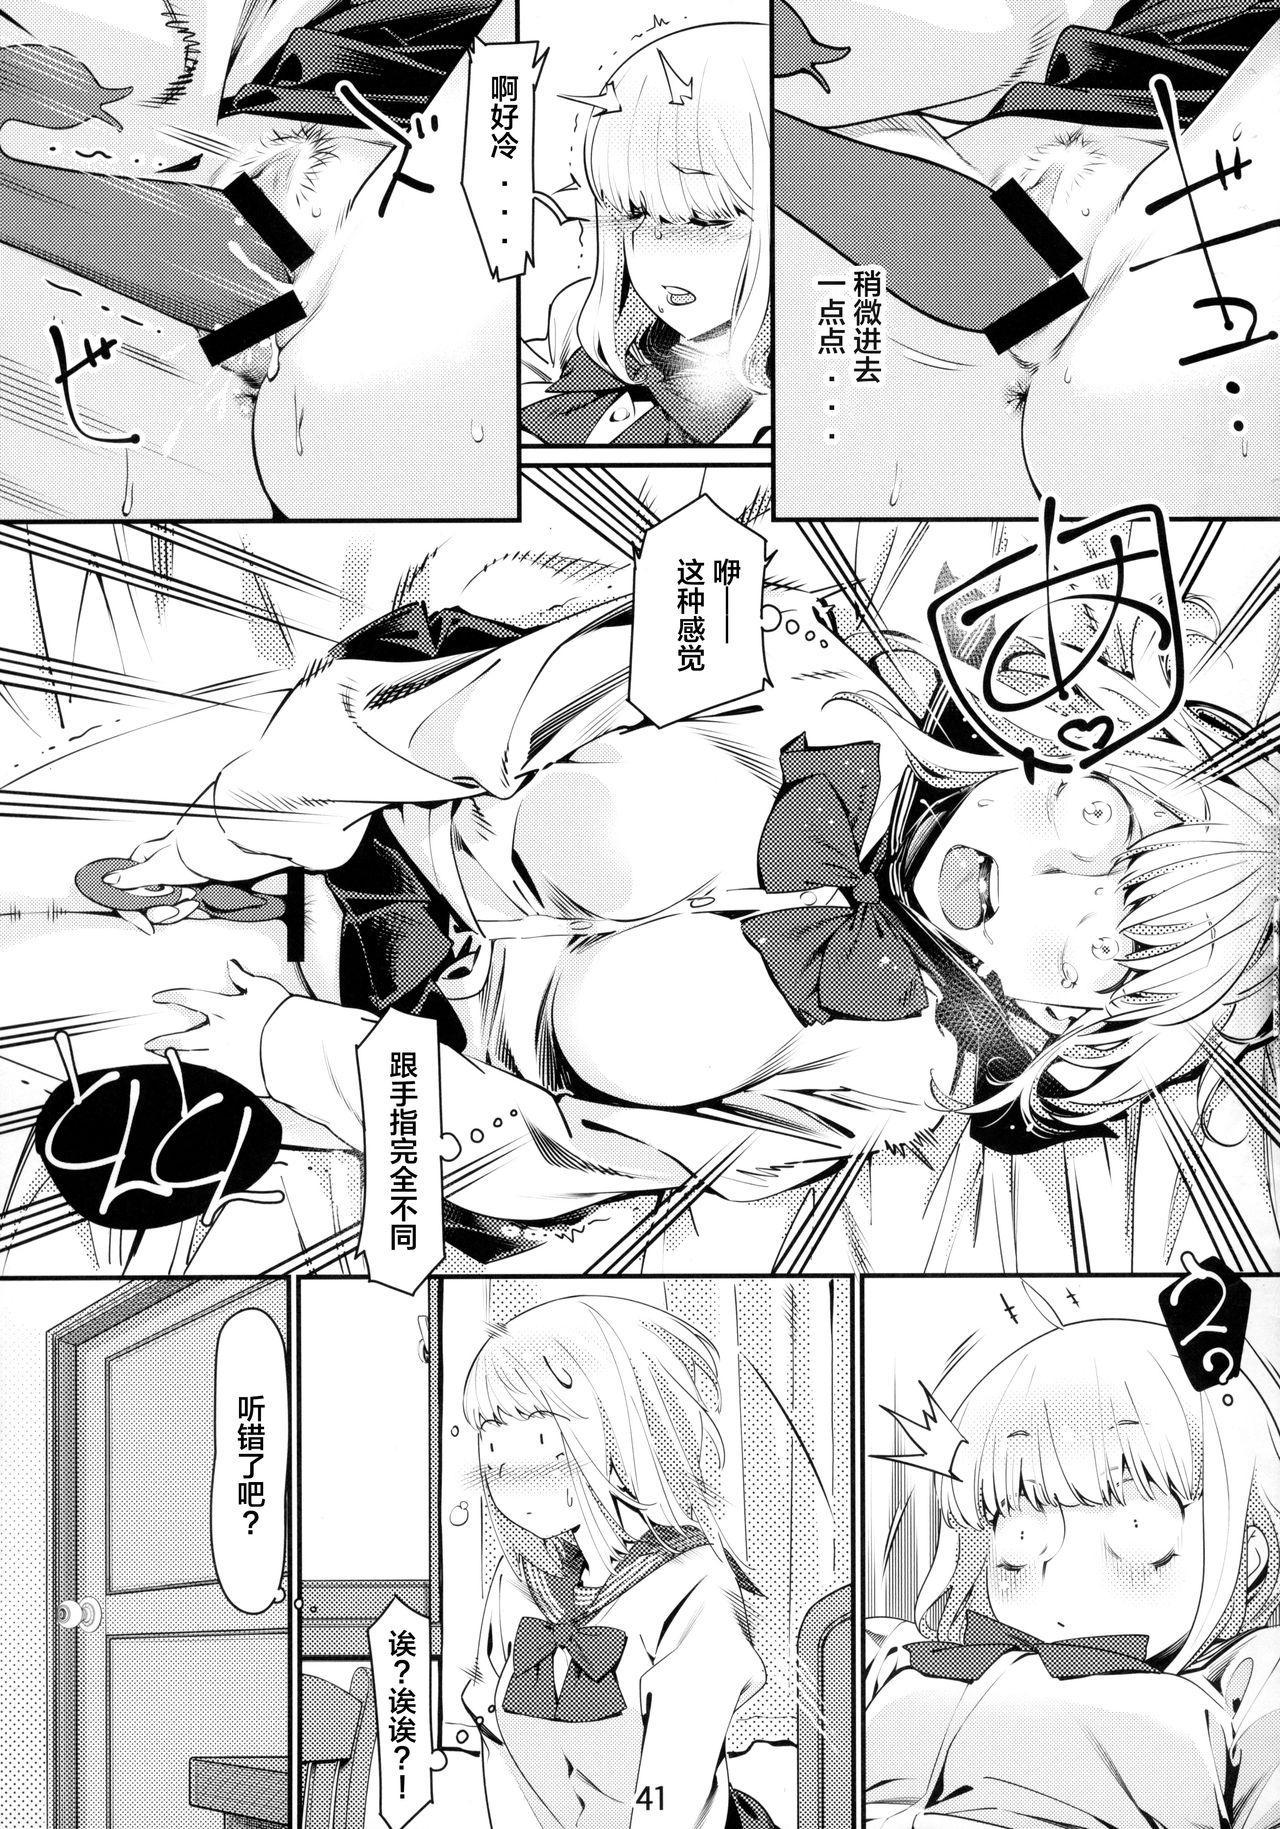 Otonano Omochiya 6 Kan 40